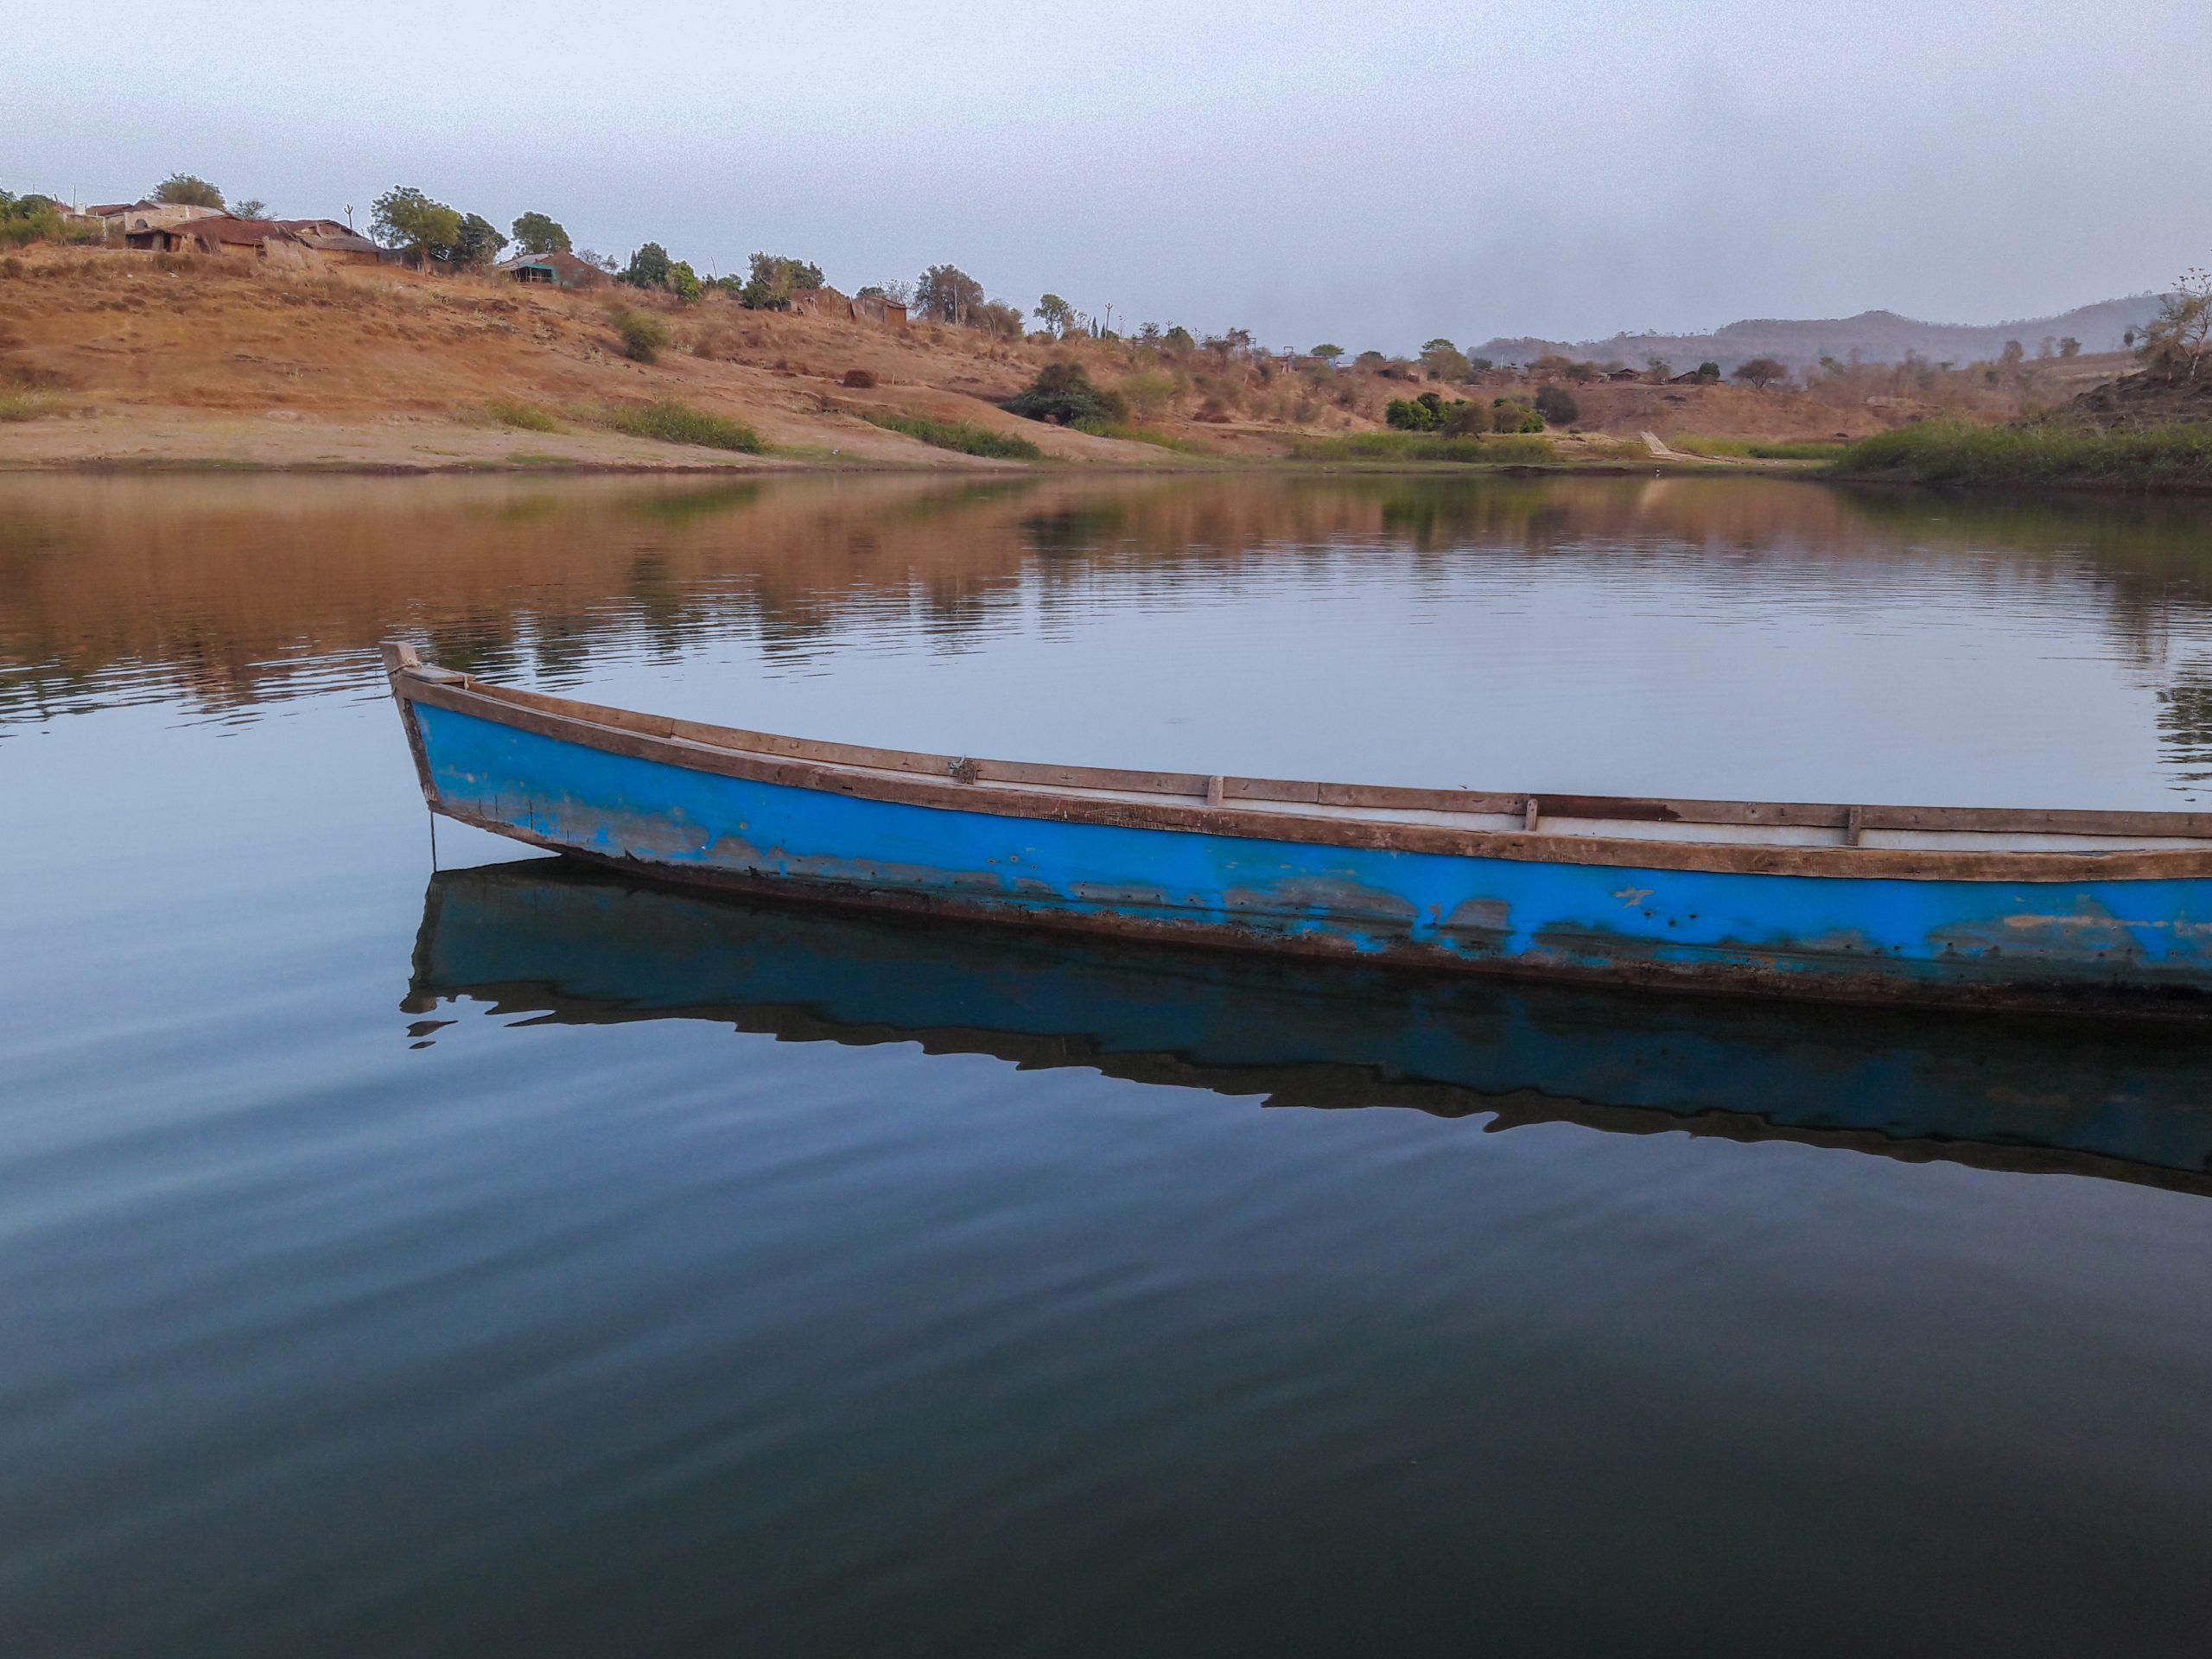 Wooden Boat in lake